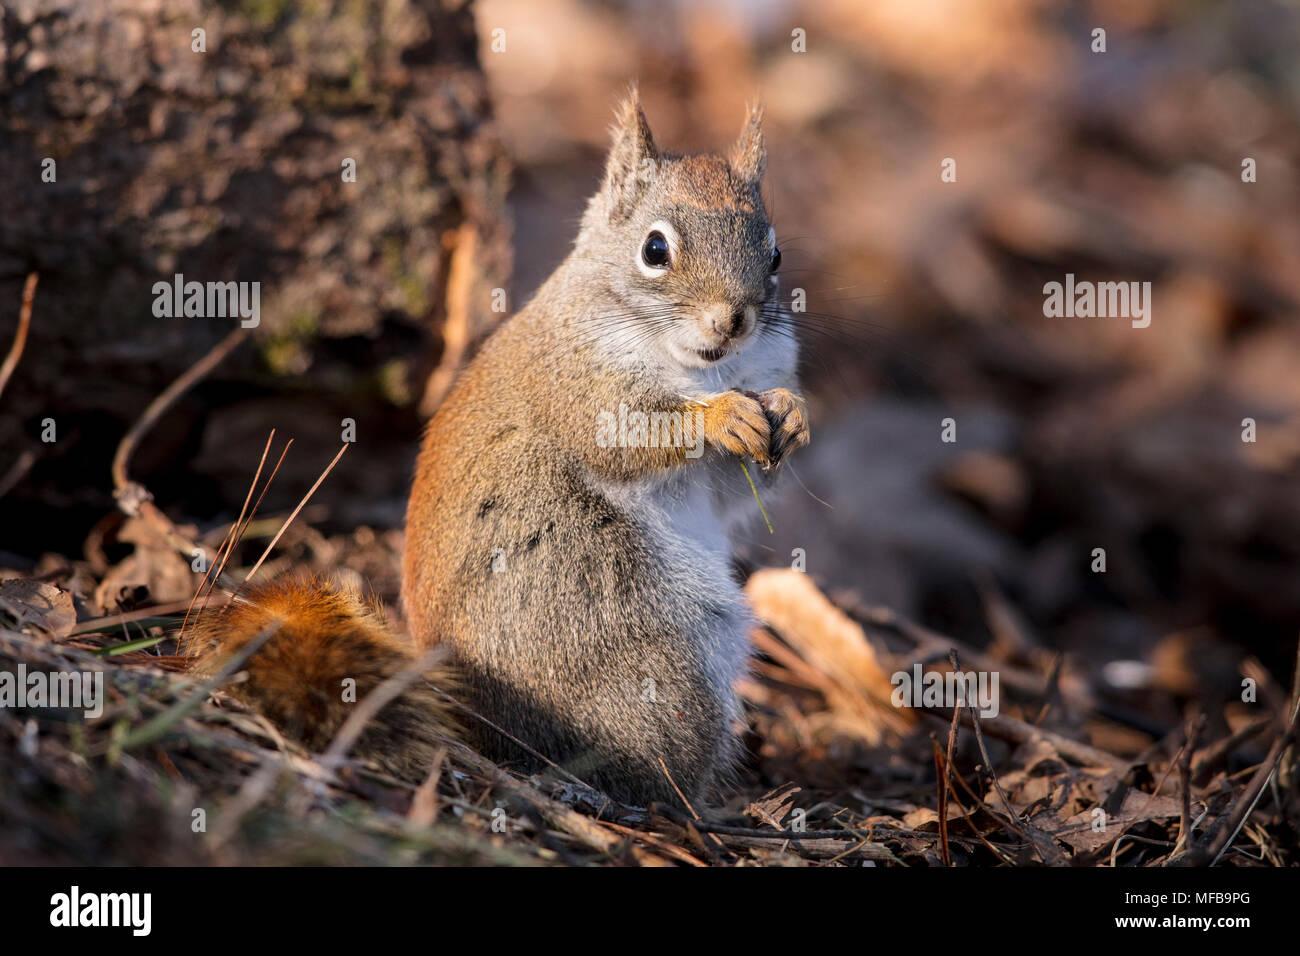 MAYNOOTH, ONTARIO, Kanada - 23 April, 2018: ein rotes Eichhörnchen (Tamiasciurus hudsonicus), Teil der Sciuridae Familie Grünfutter für Lebensmittel. (Ryan Carter) Stockbild